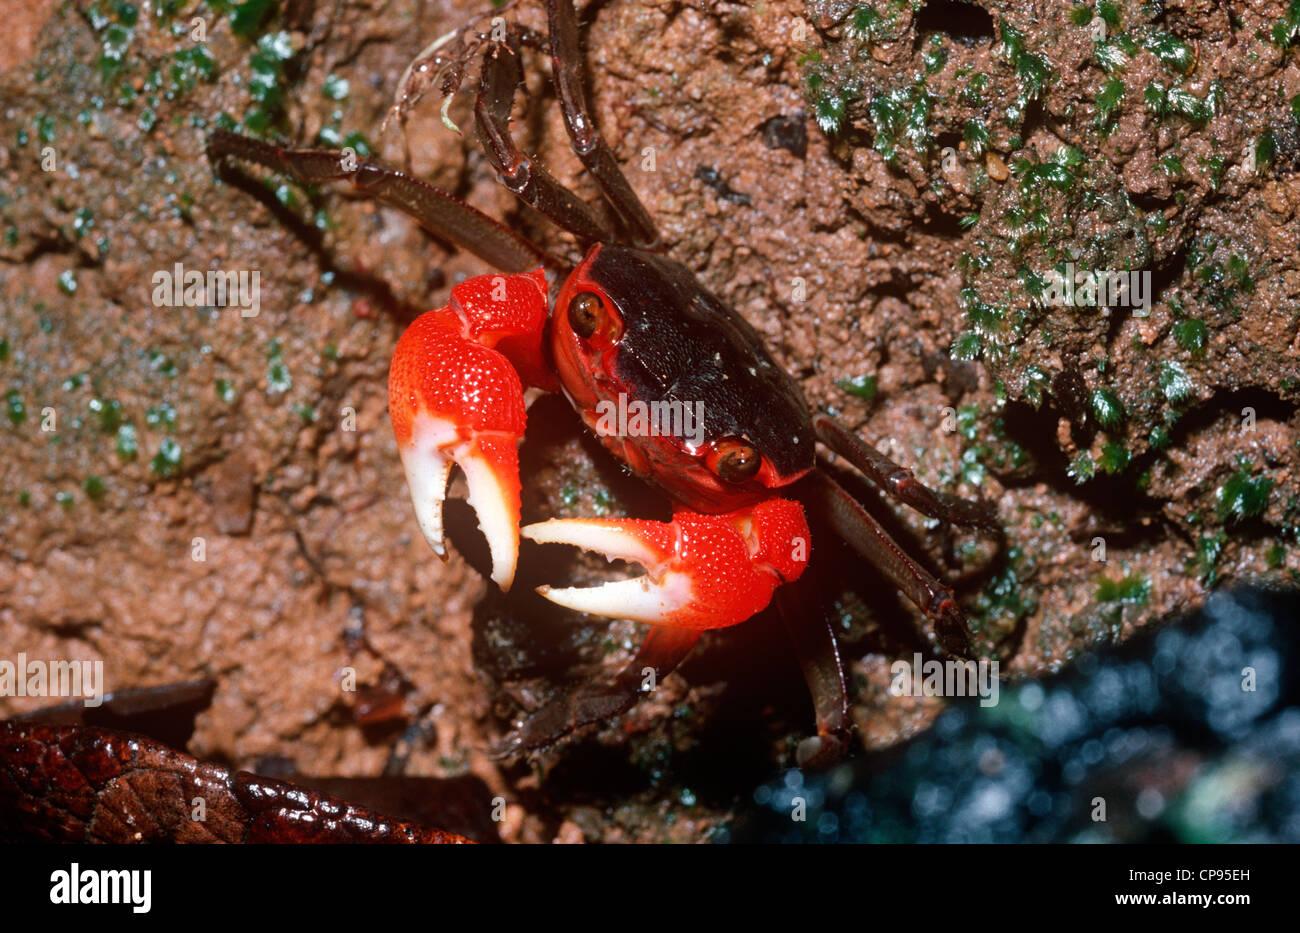 Crab (Sesarma gracilipes: Grapsidae) in coastal rainforest Madagascar - Stock Image